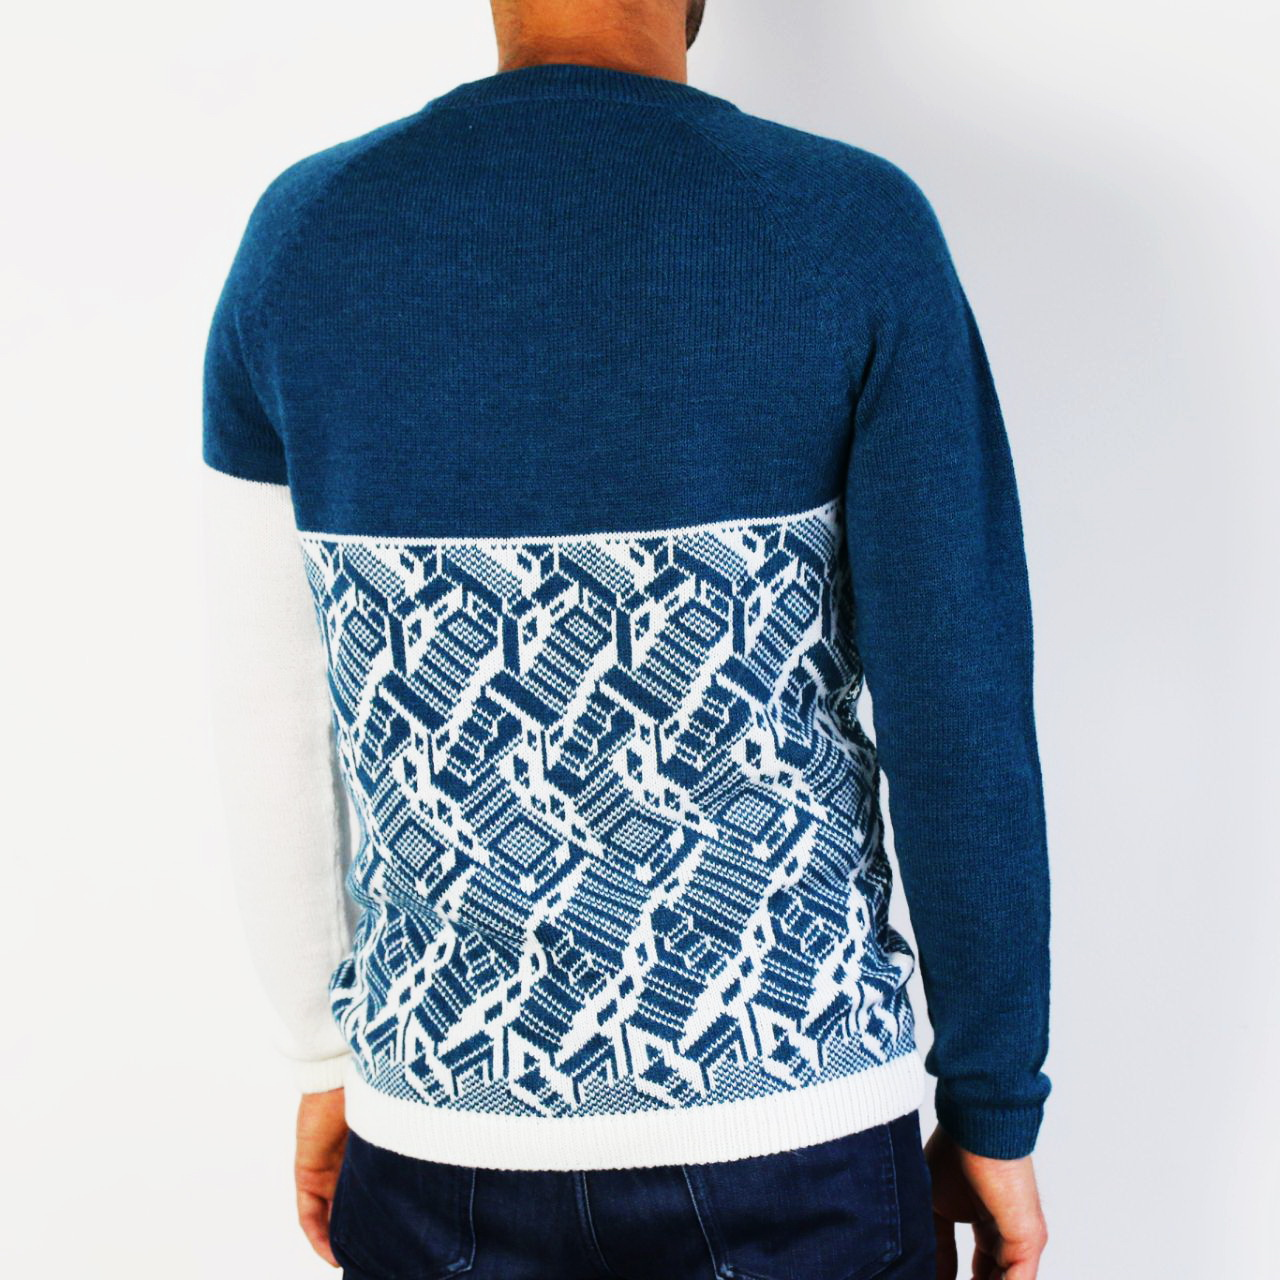 wool sweater mekoome no exit 5 1